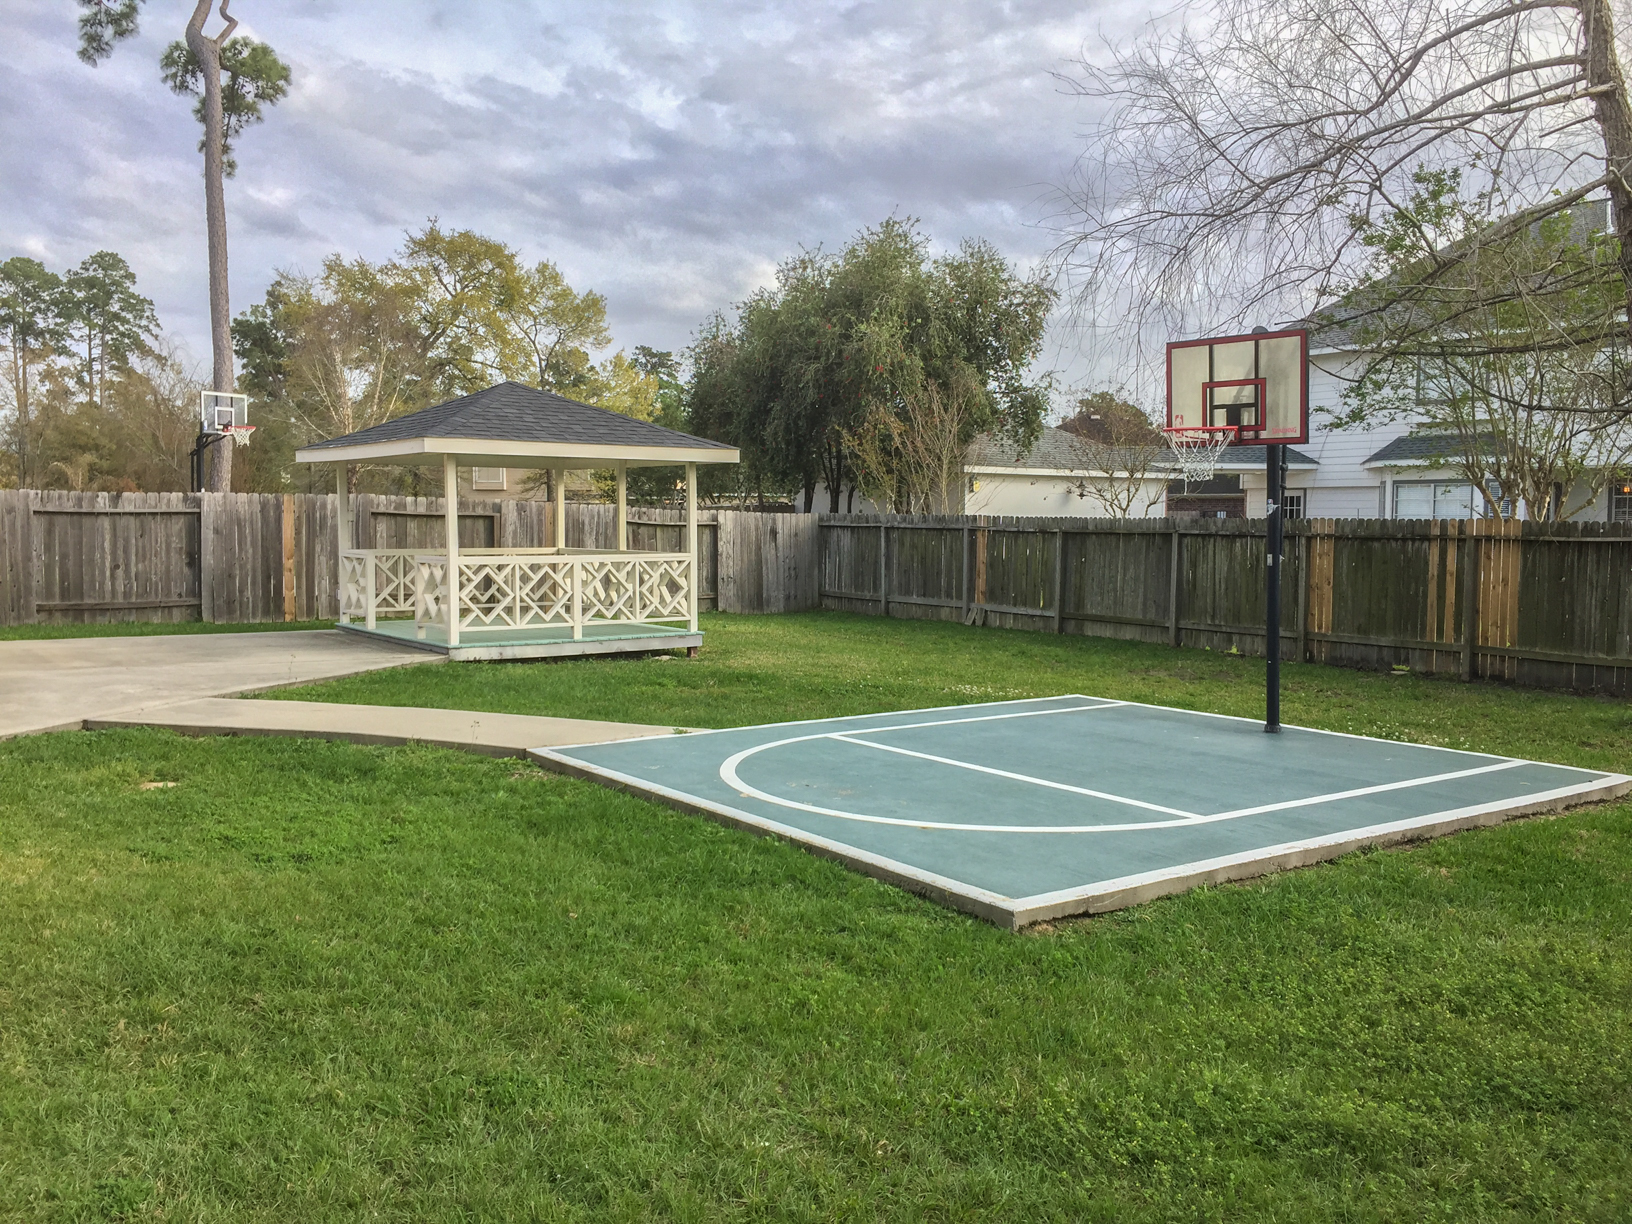 Photo of 8127 Edenwood Drive, spring, TX, 77389